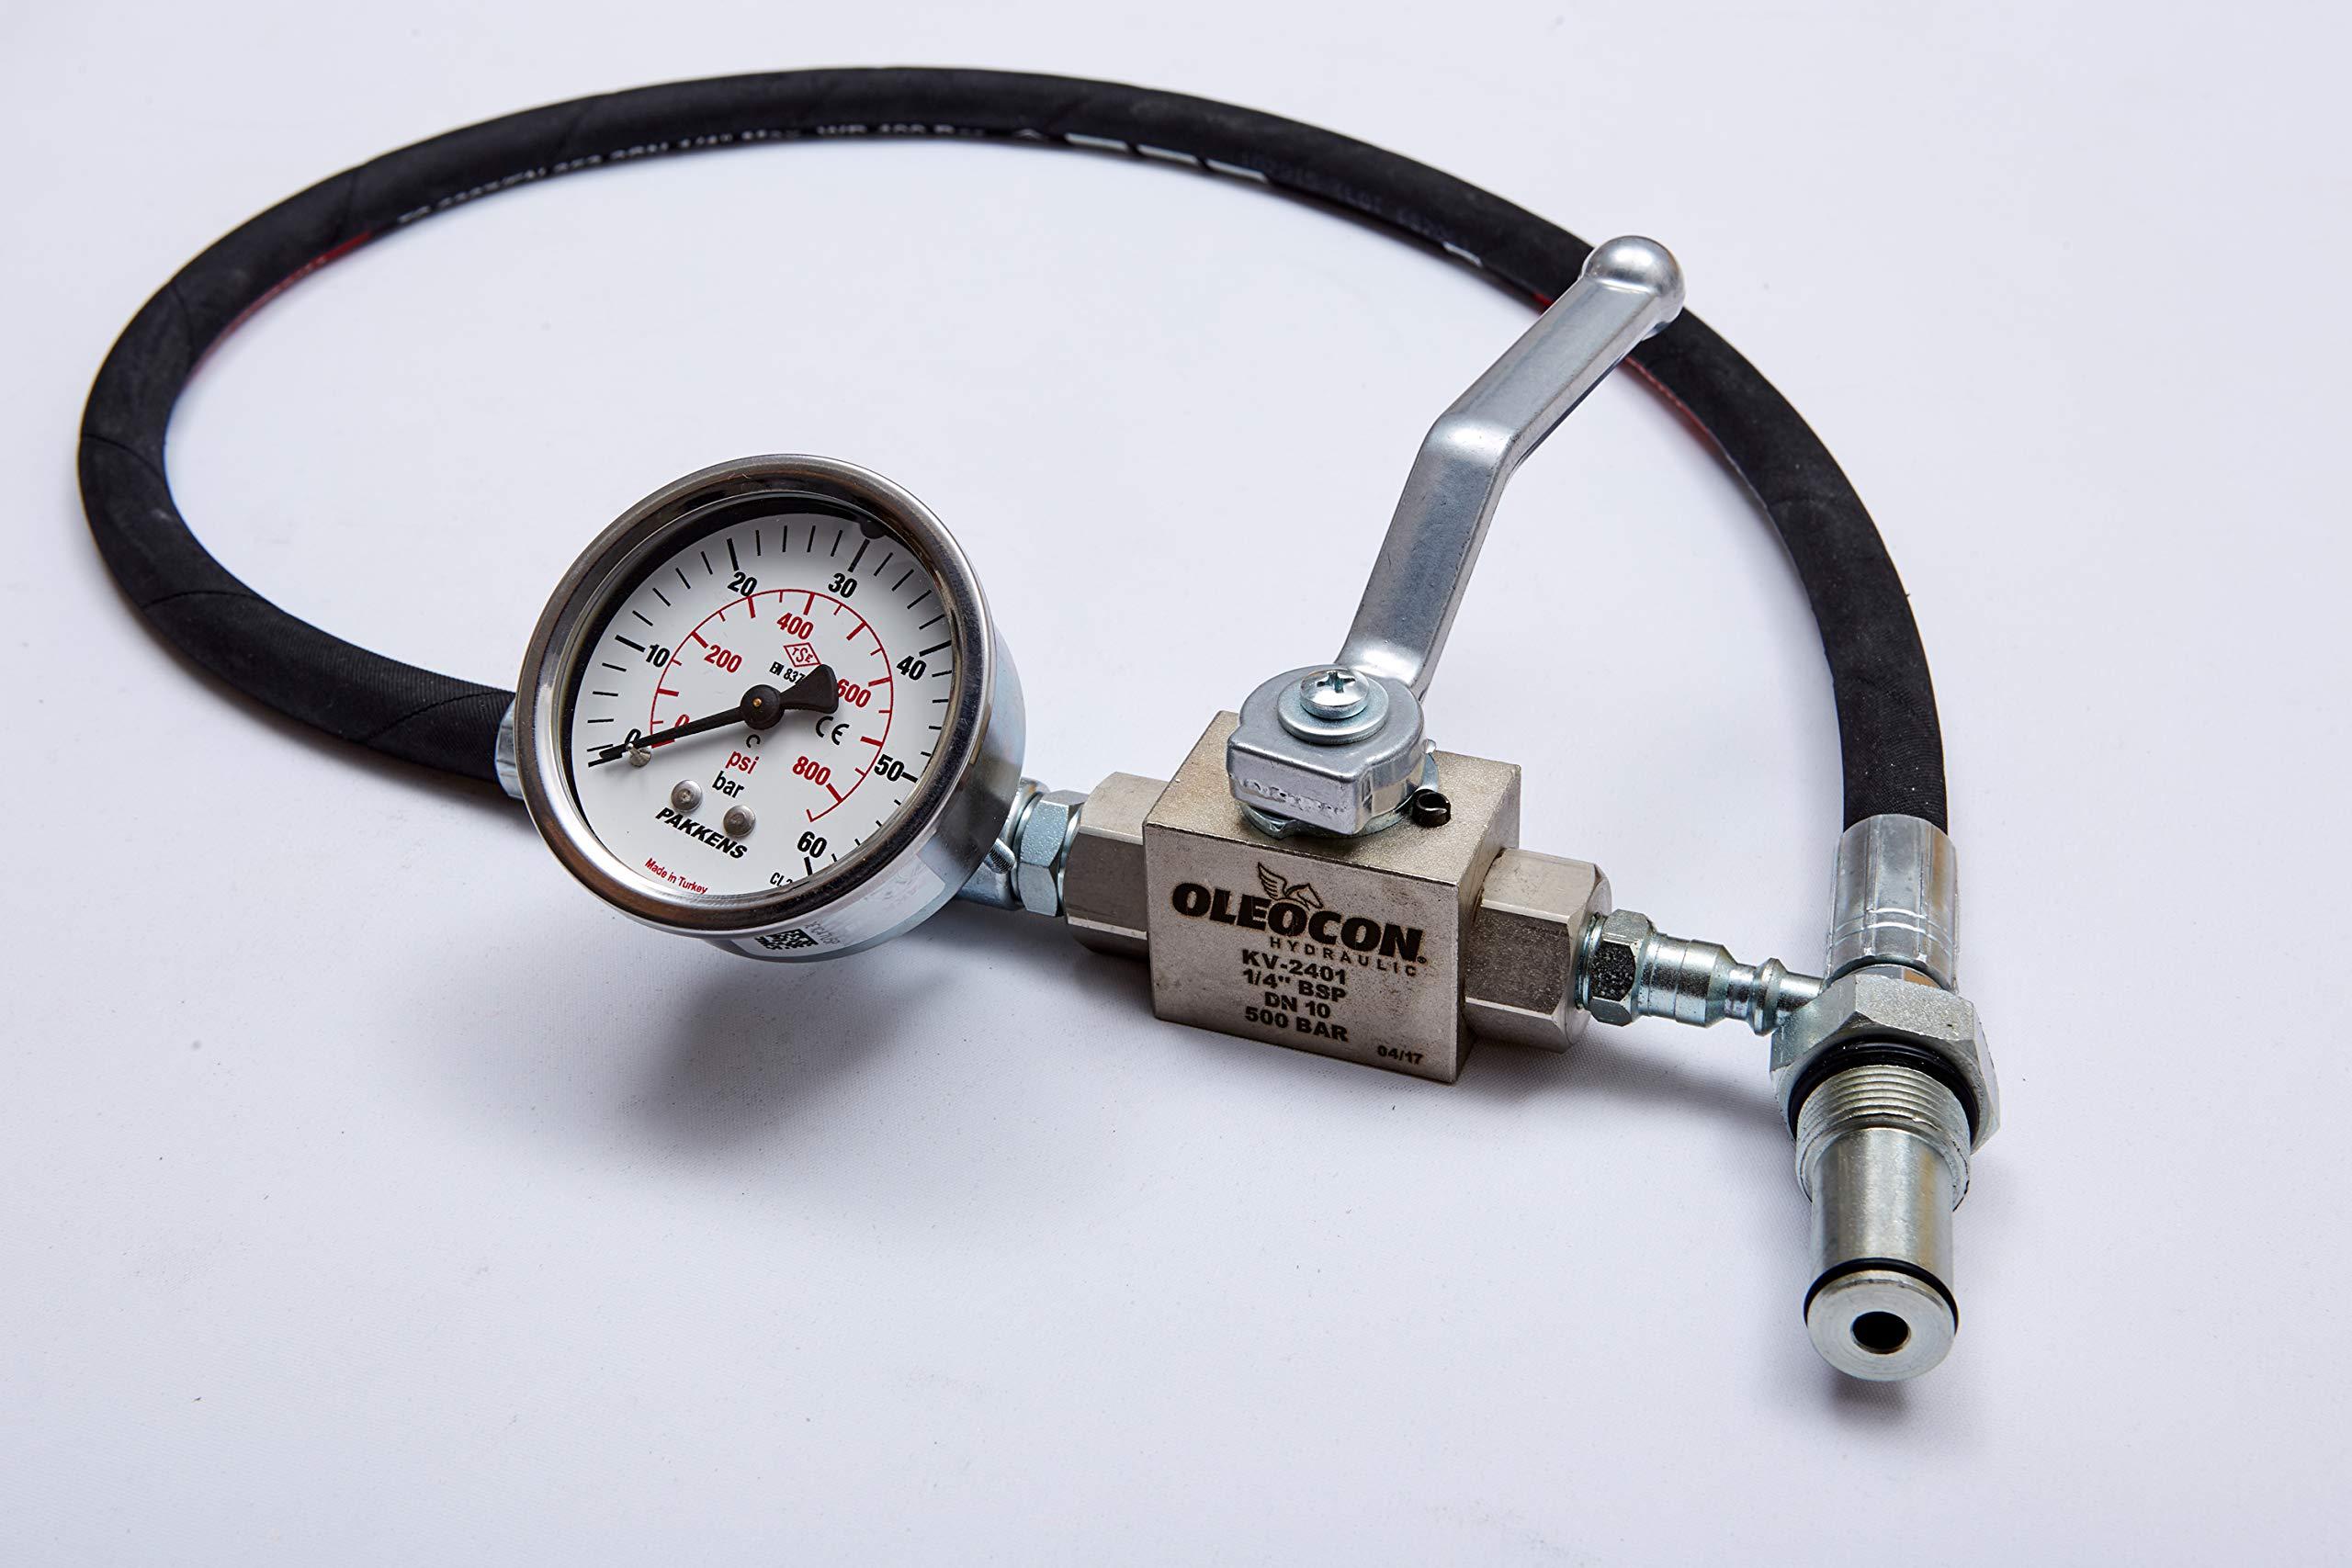 TR DIESEL Ford 6.0 Powerstroke High Pressure Oil System IPR Air Test Tool Special KIT II